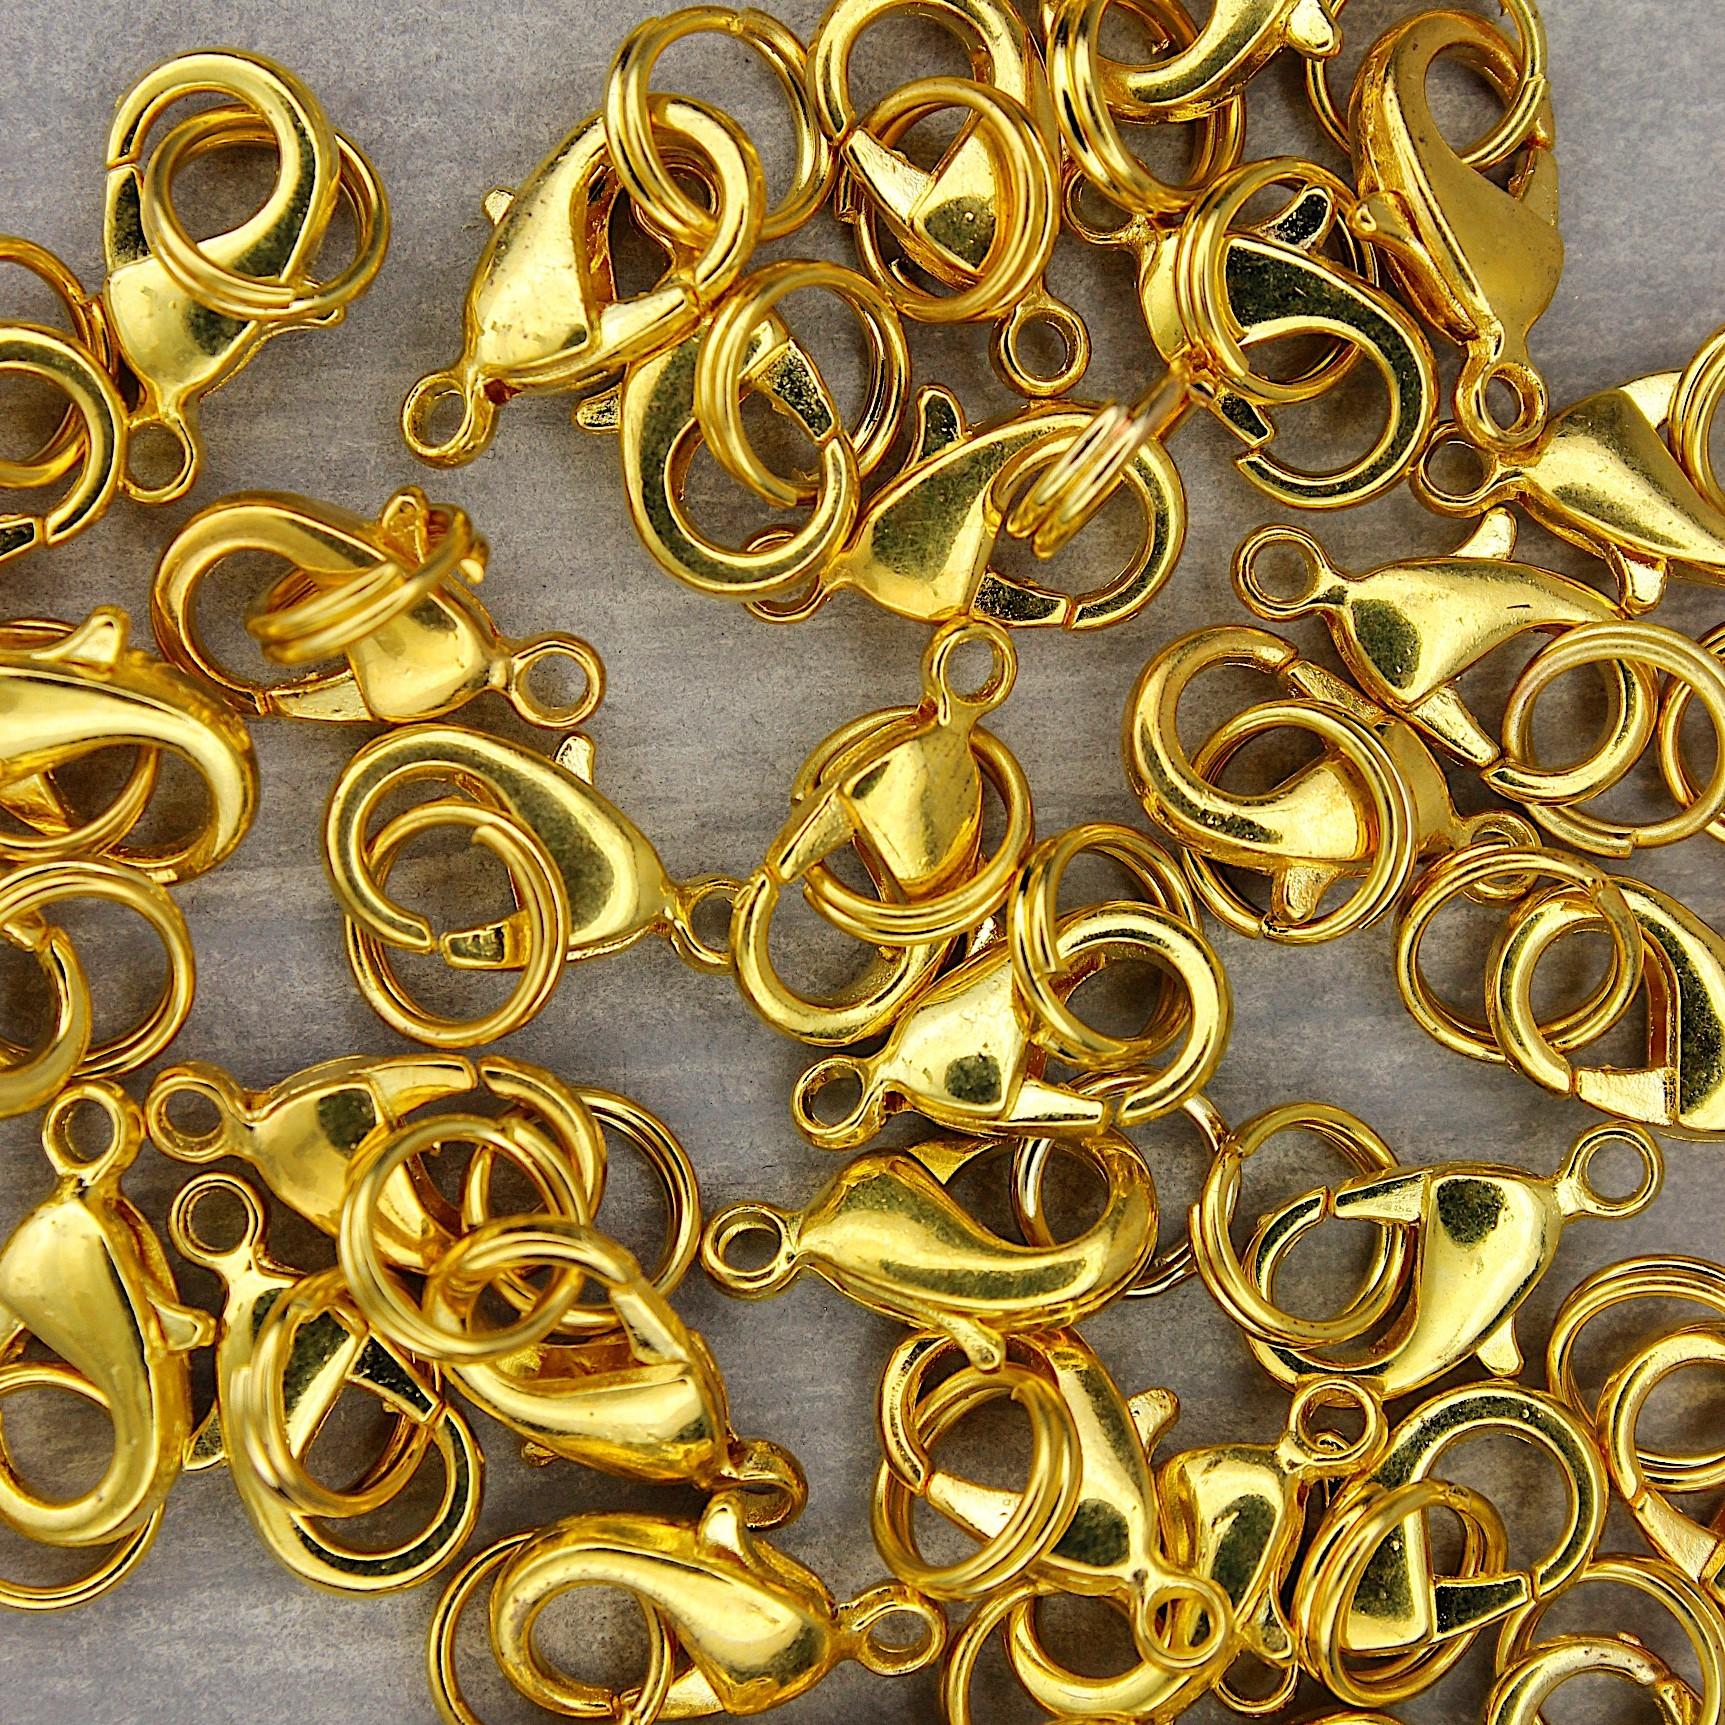 goldig 12mm